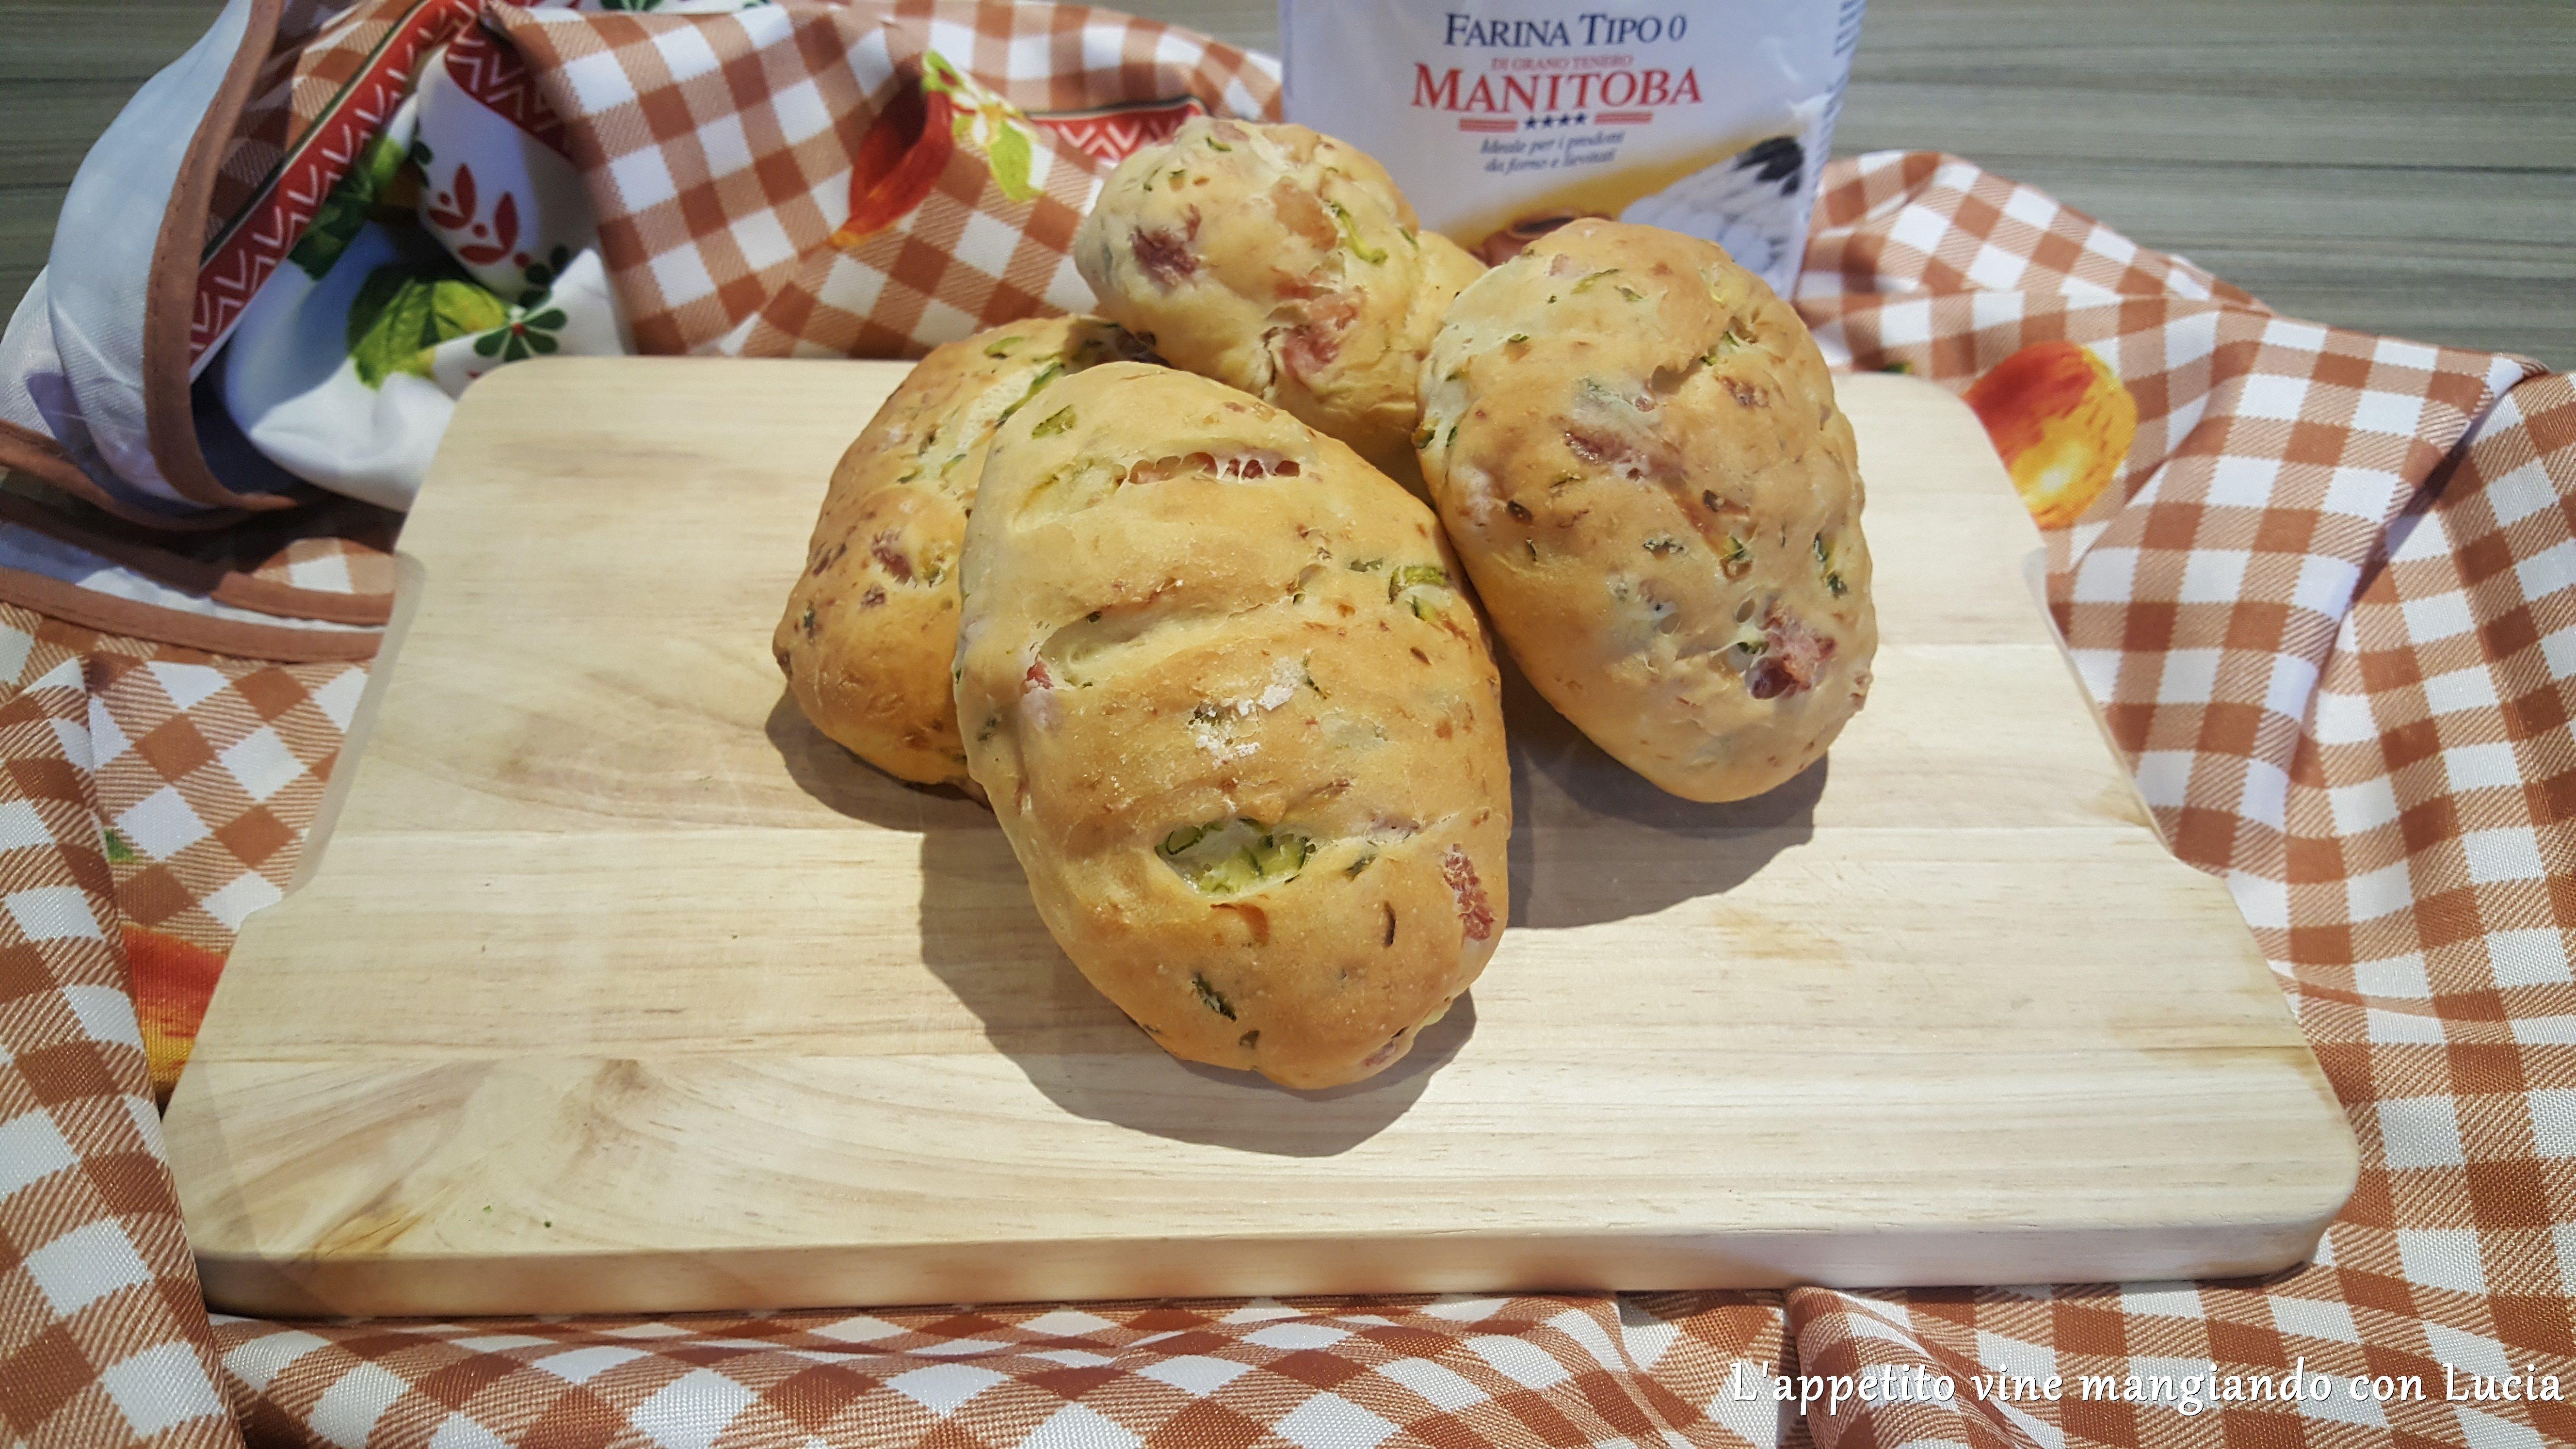 Pane con zucchine e pancetta